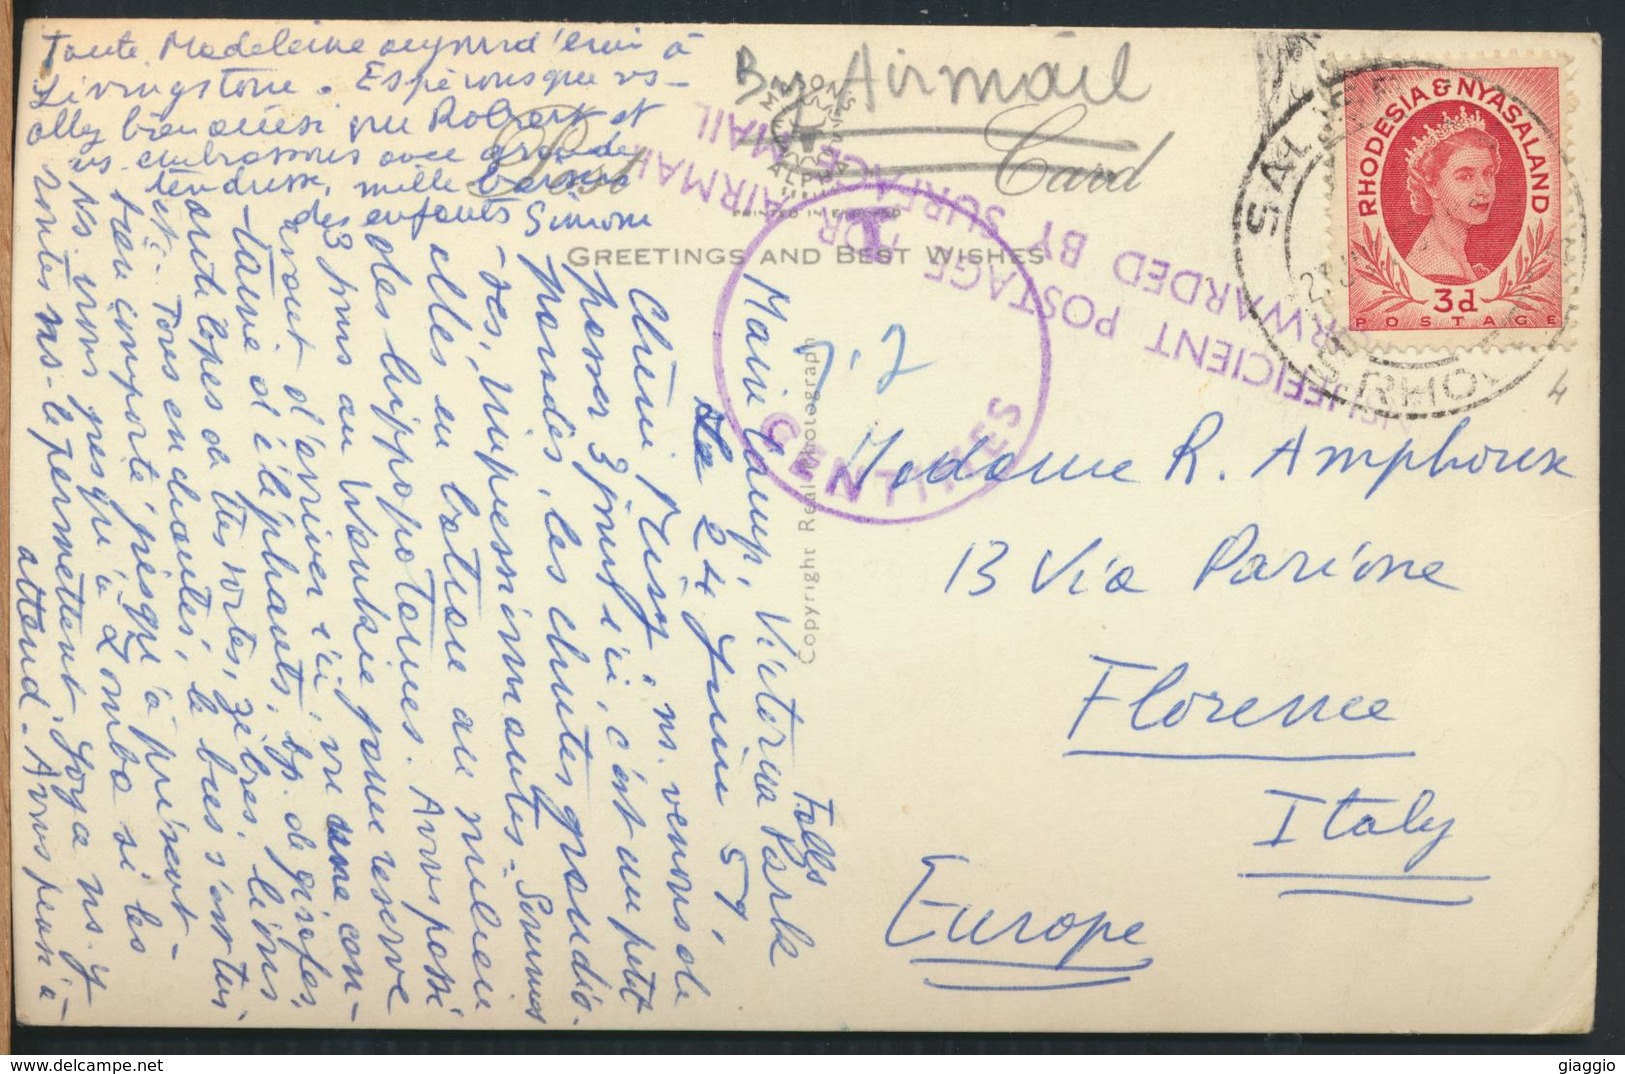 °°° 13142 - RHODESIA & NYASALAND - EASTERN CATARACT , VICTORIA FALLS - 1959 With Stamps °°° - Zimbabwe